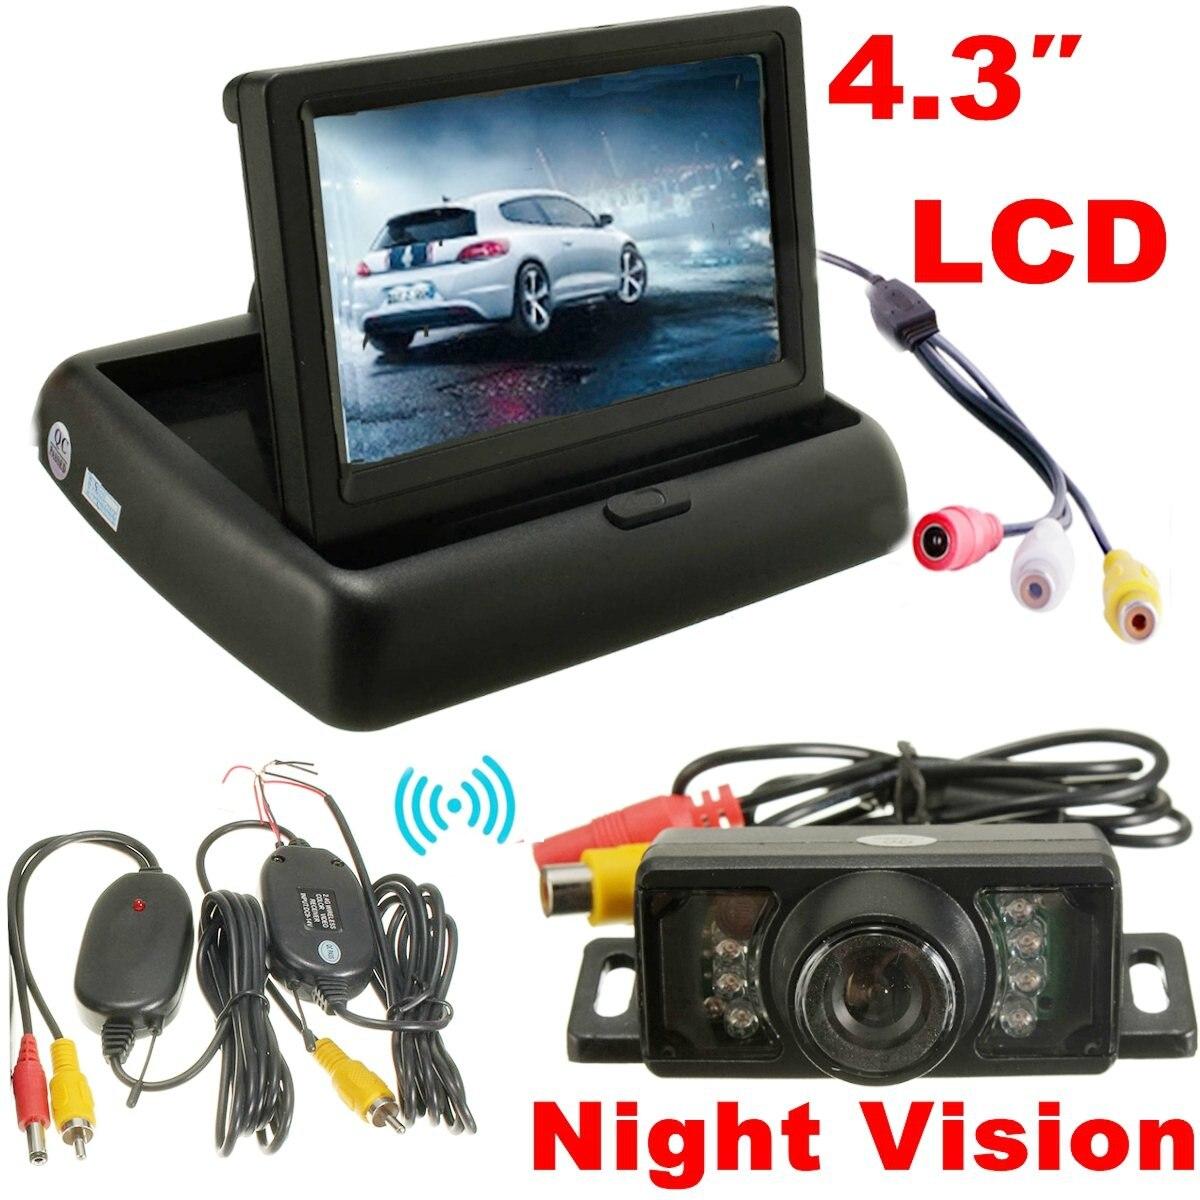 Car Foldable 4 3 Monitor Wireless IR Rearview Parking Reversing font b Camera b font Kit